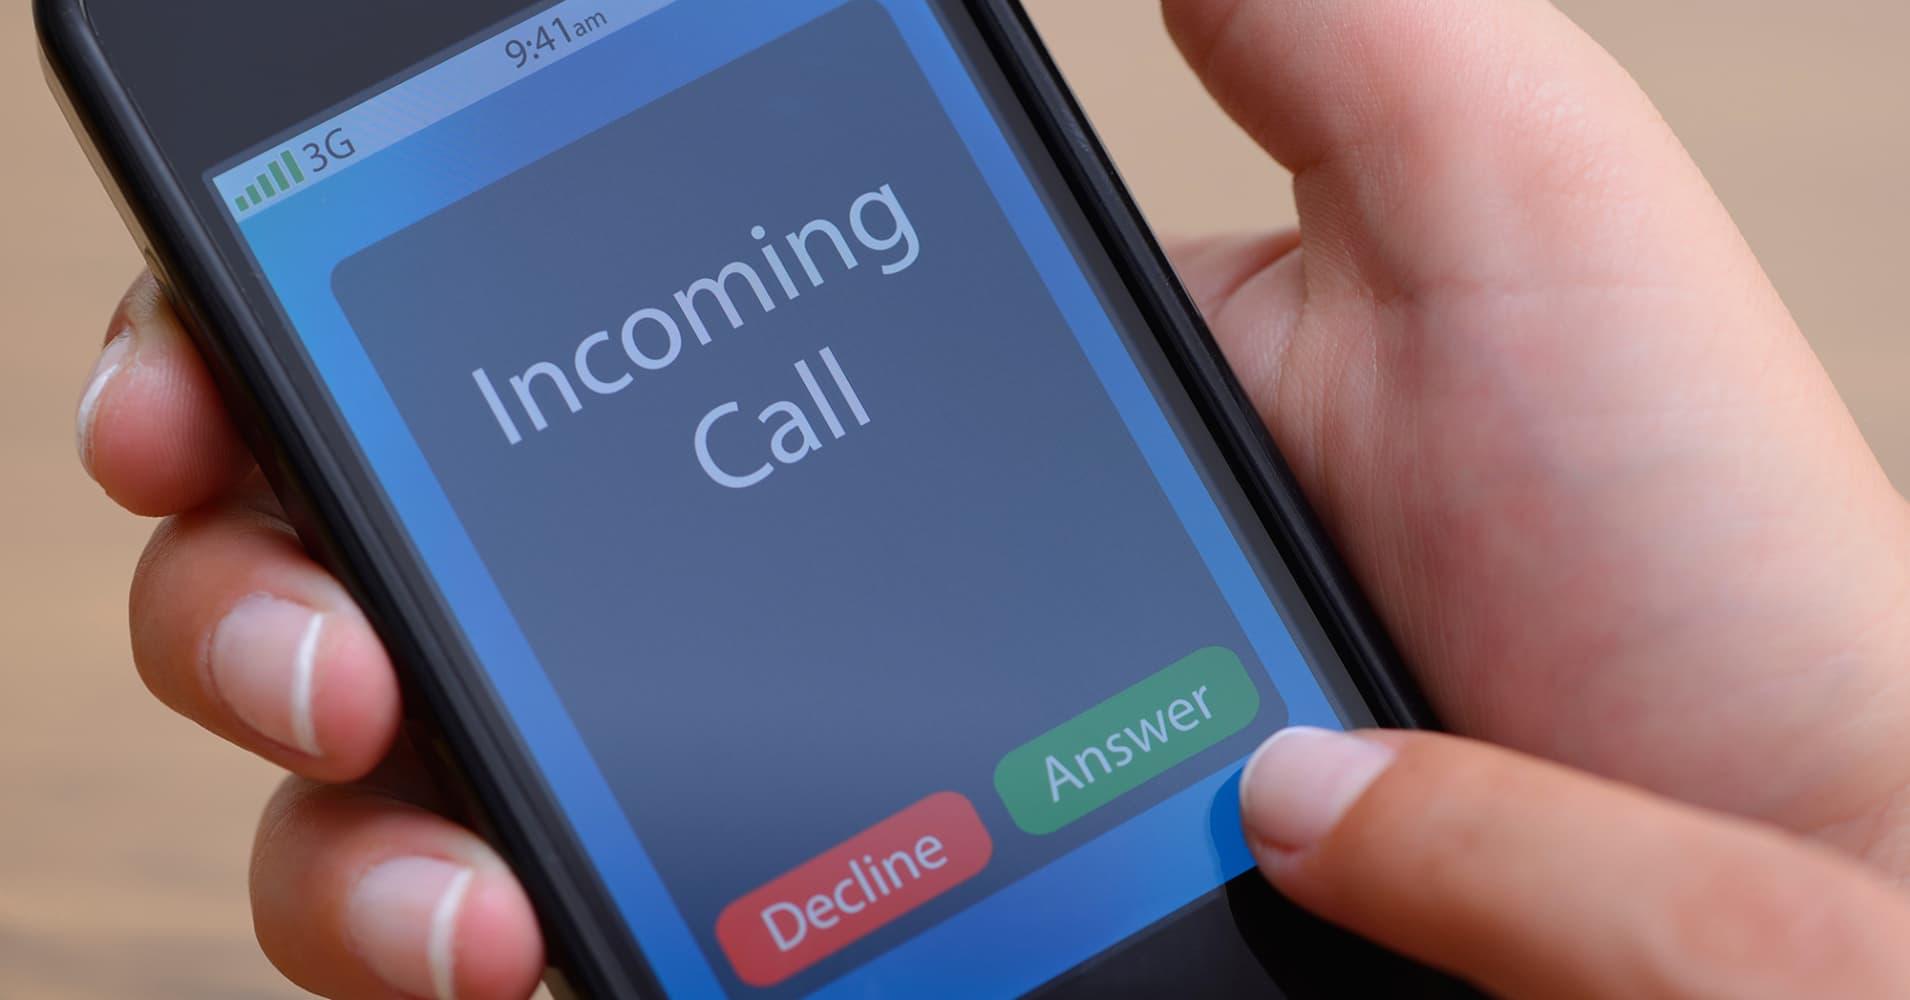 Blocking unwanted calls - cell phone block calls app